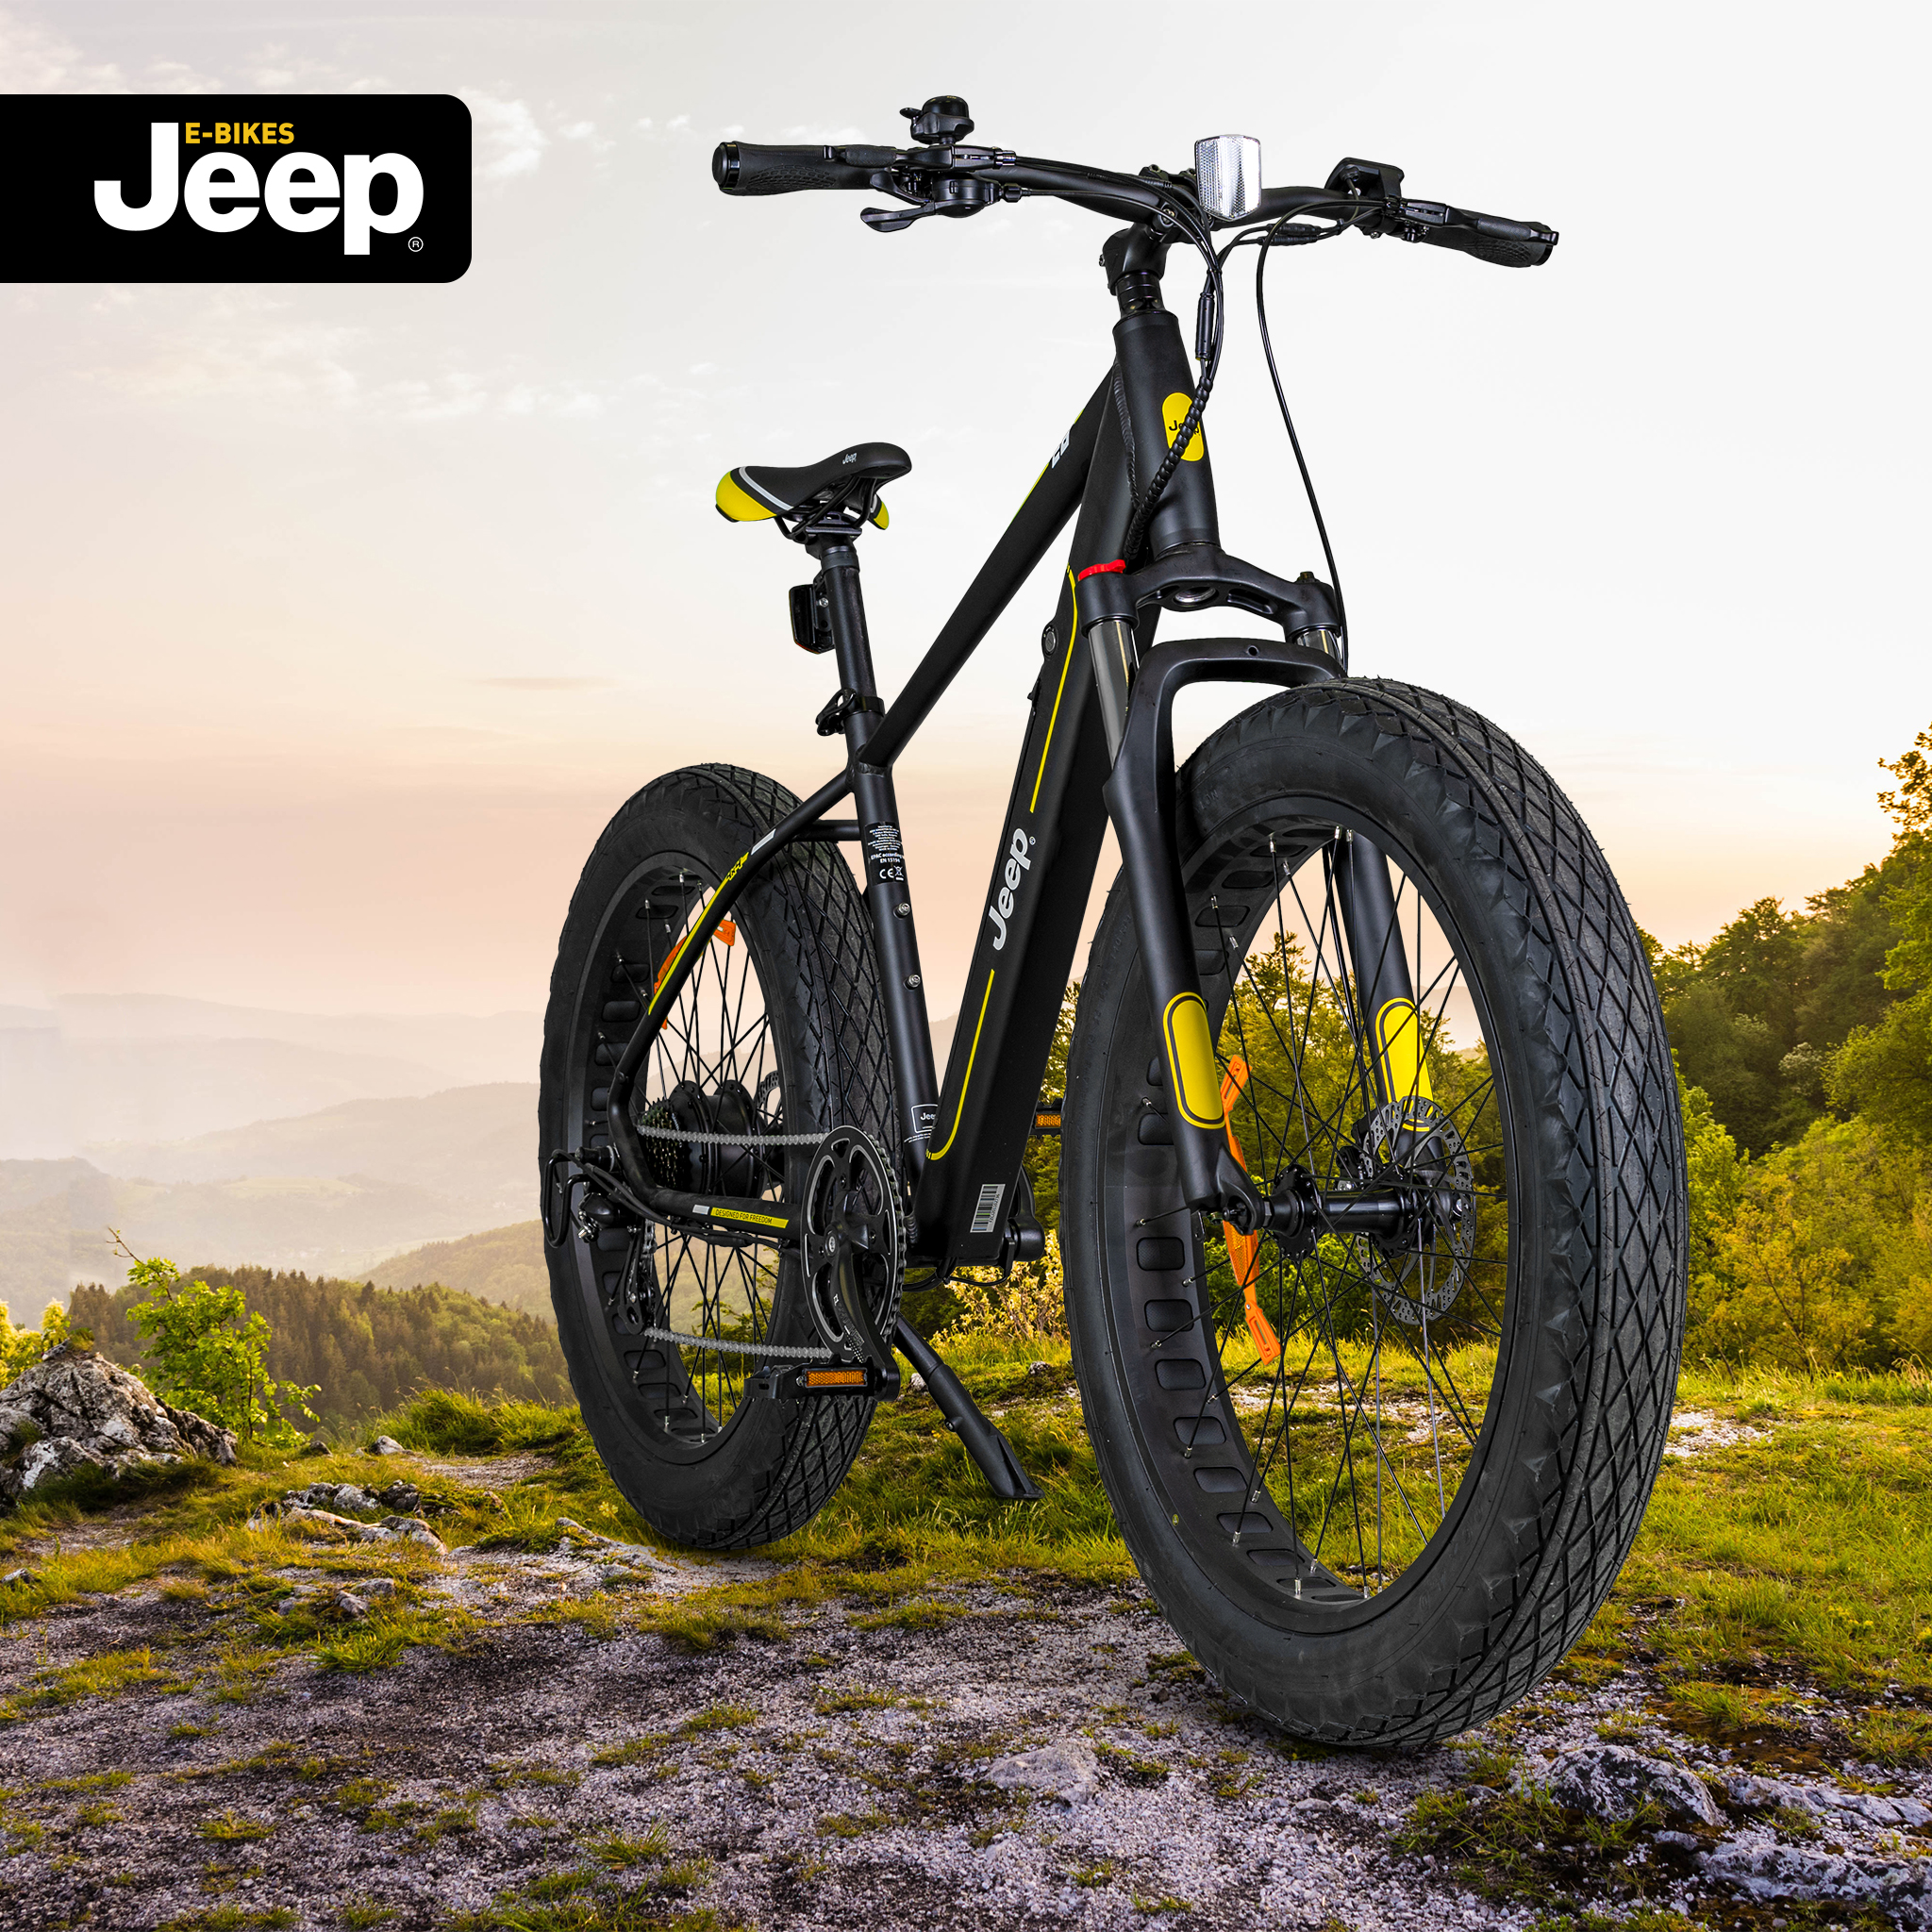 PI vom 26.03.2021 | Jeep Mountain FAT E-Bike MHFR 7100